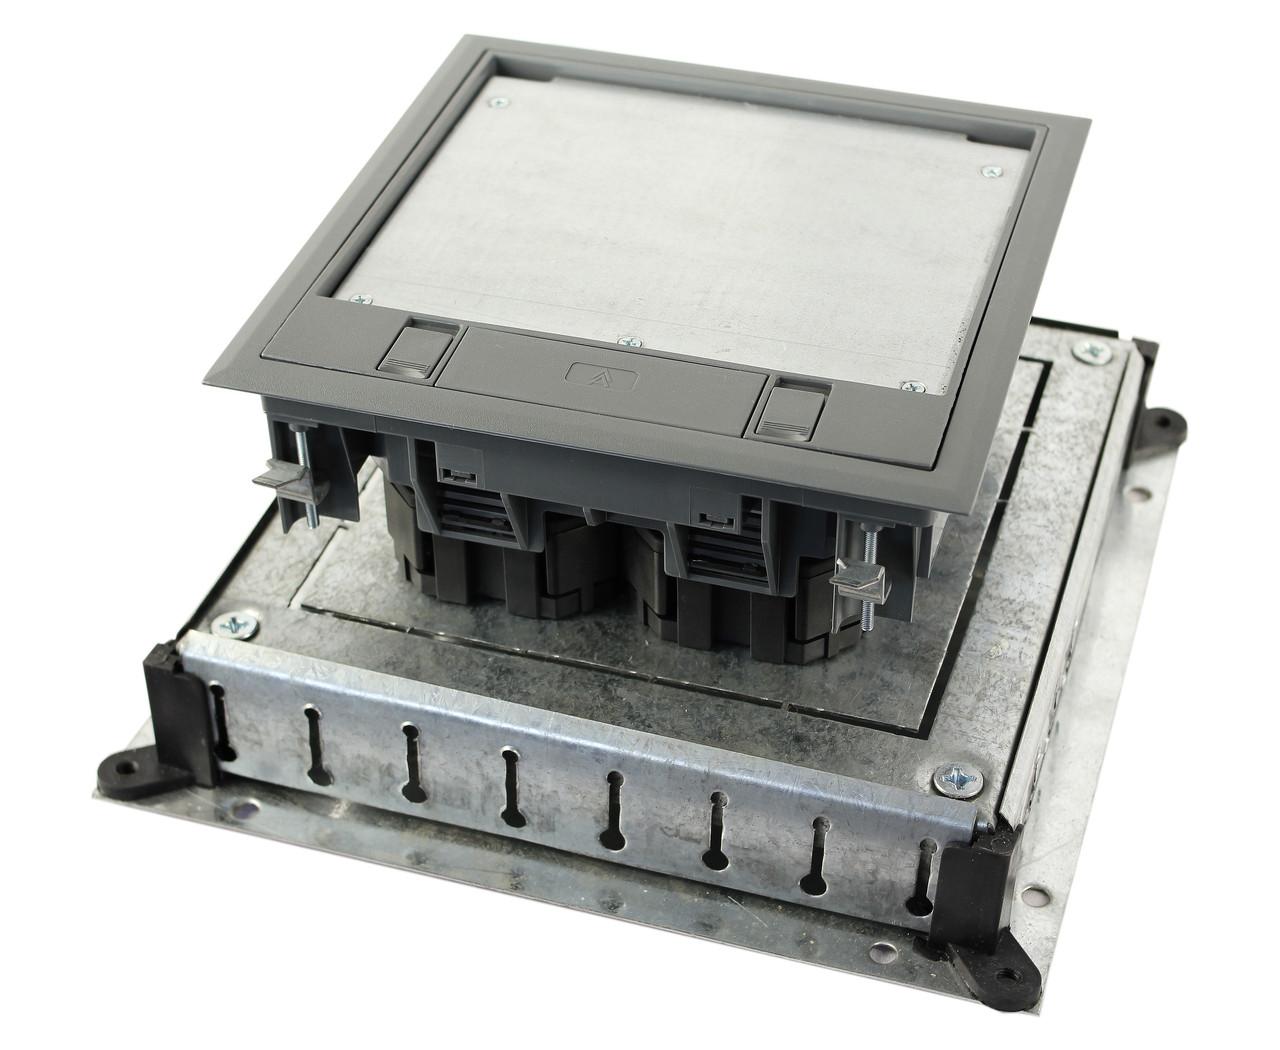 Монтажное основание под заливку в бетон, для лючка 7405145, размер 300х300 мм